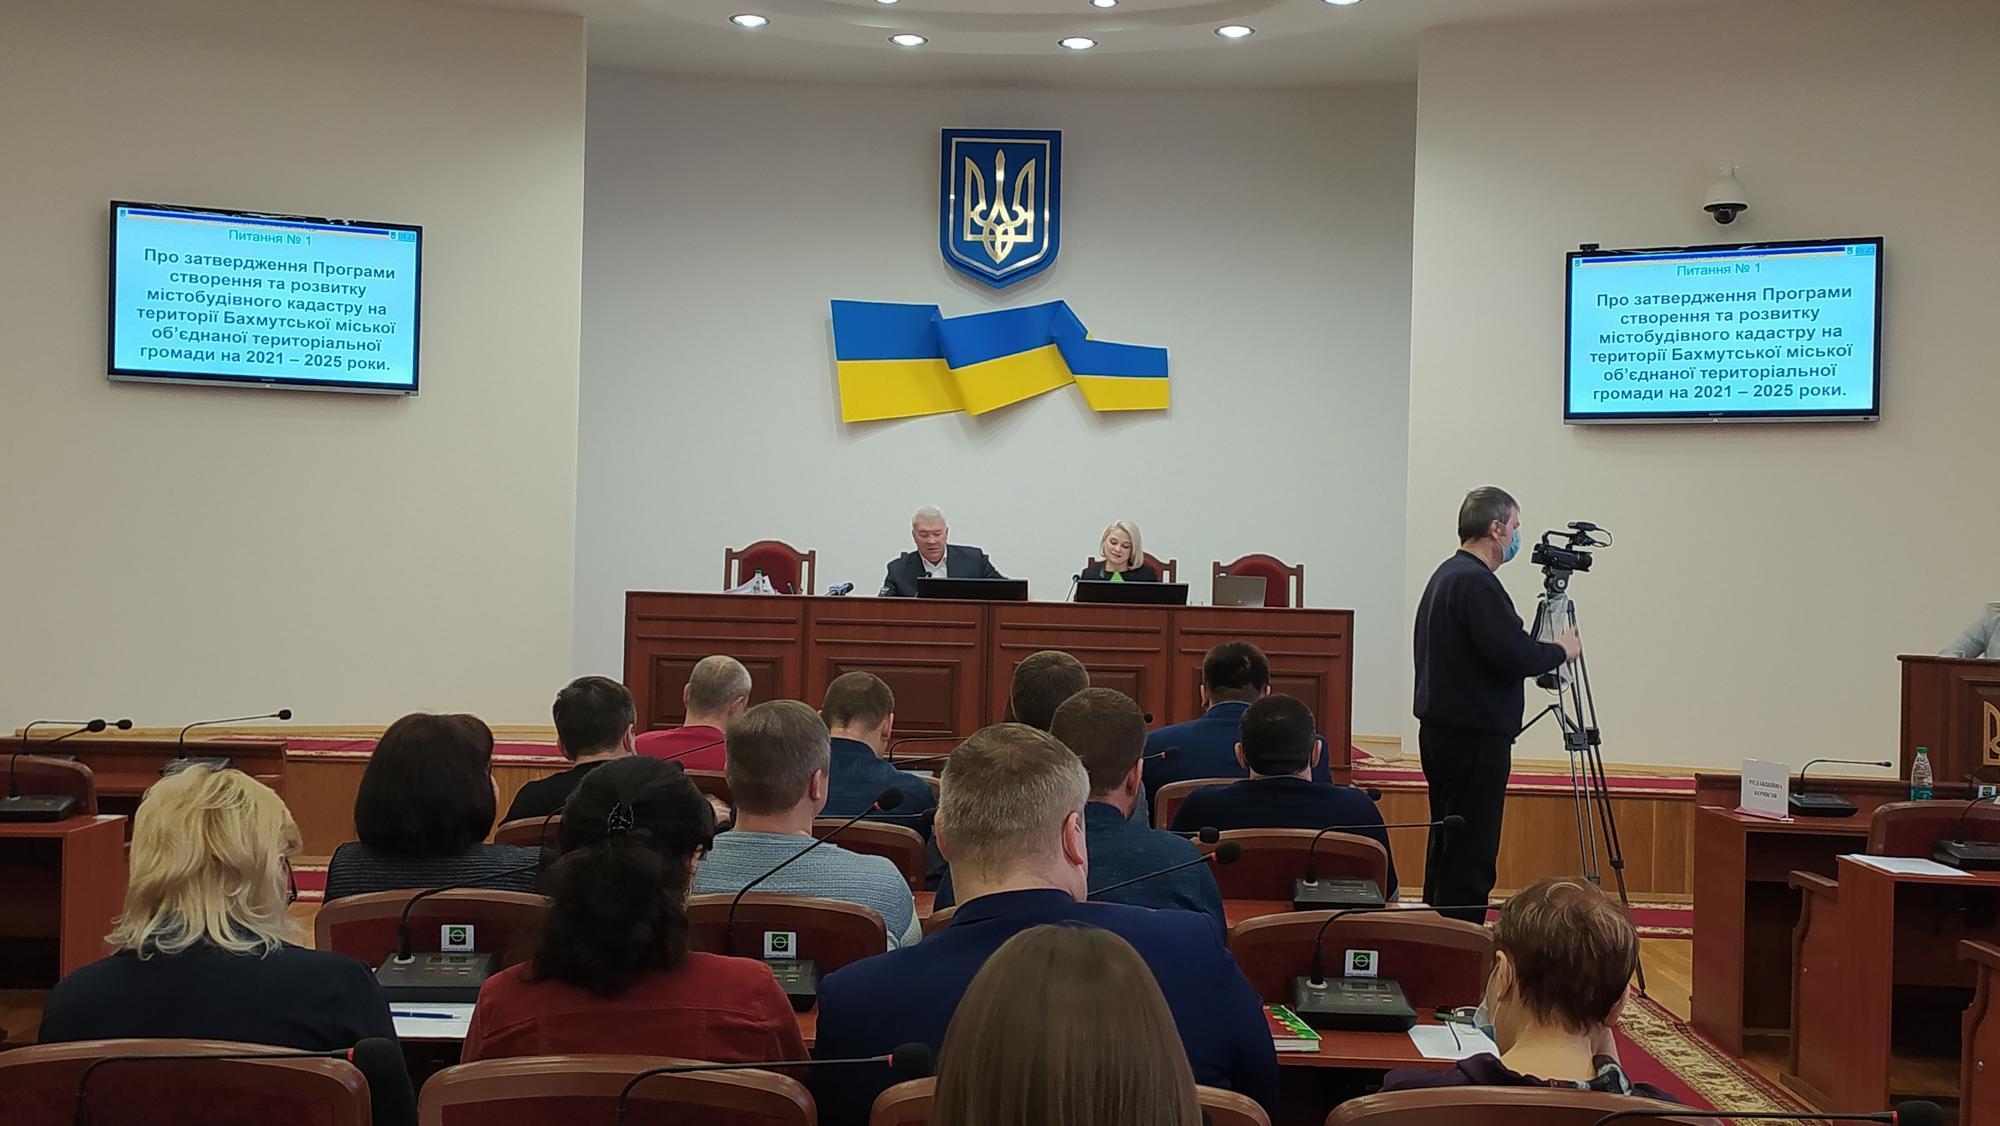 Мер Бахмута Олексій Рева та секретар міськради Анастасія Касперська були на сесії без масок